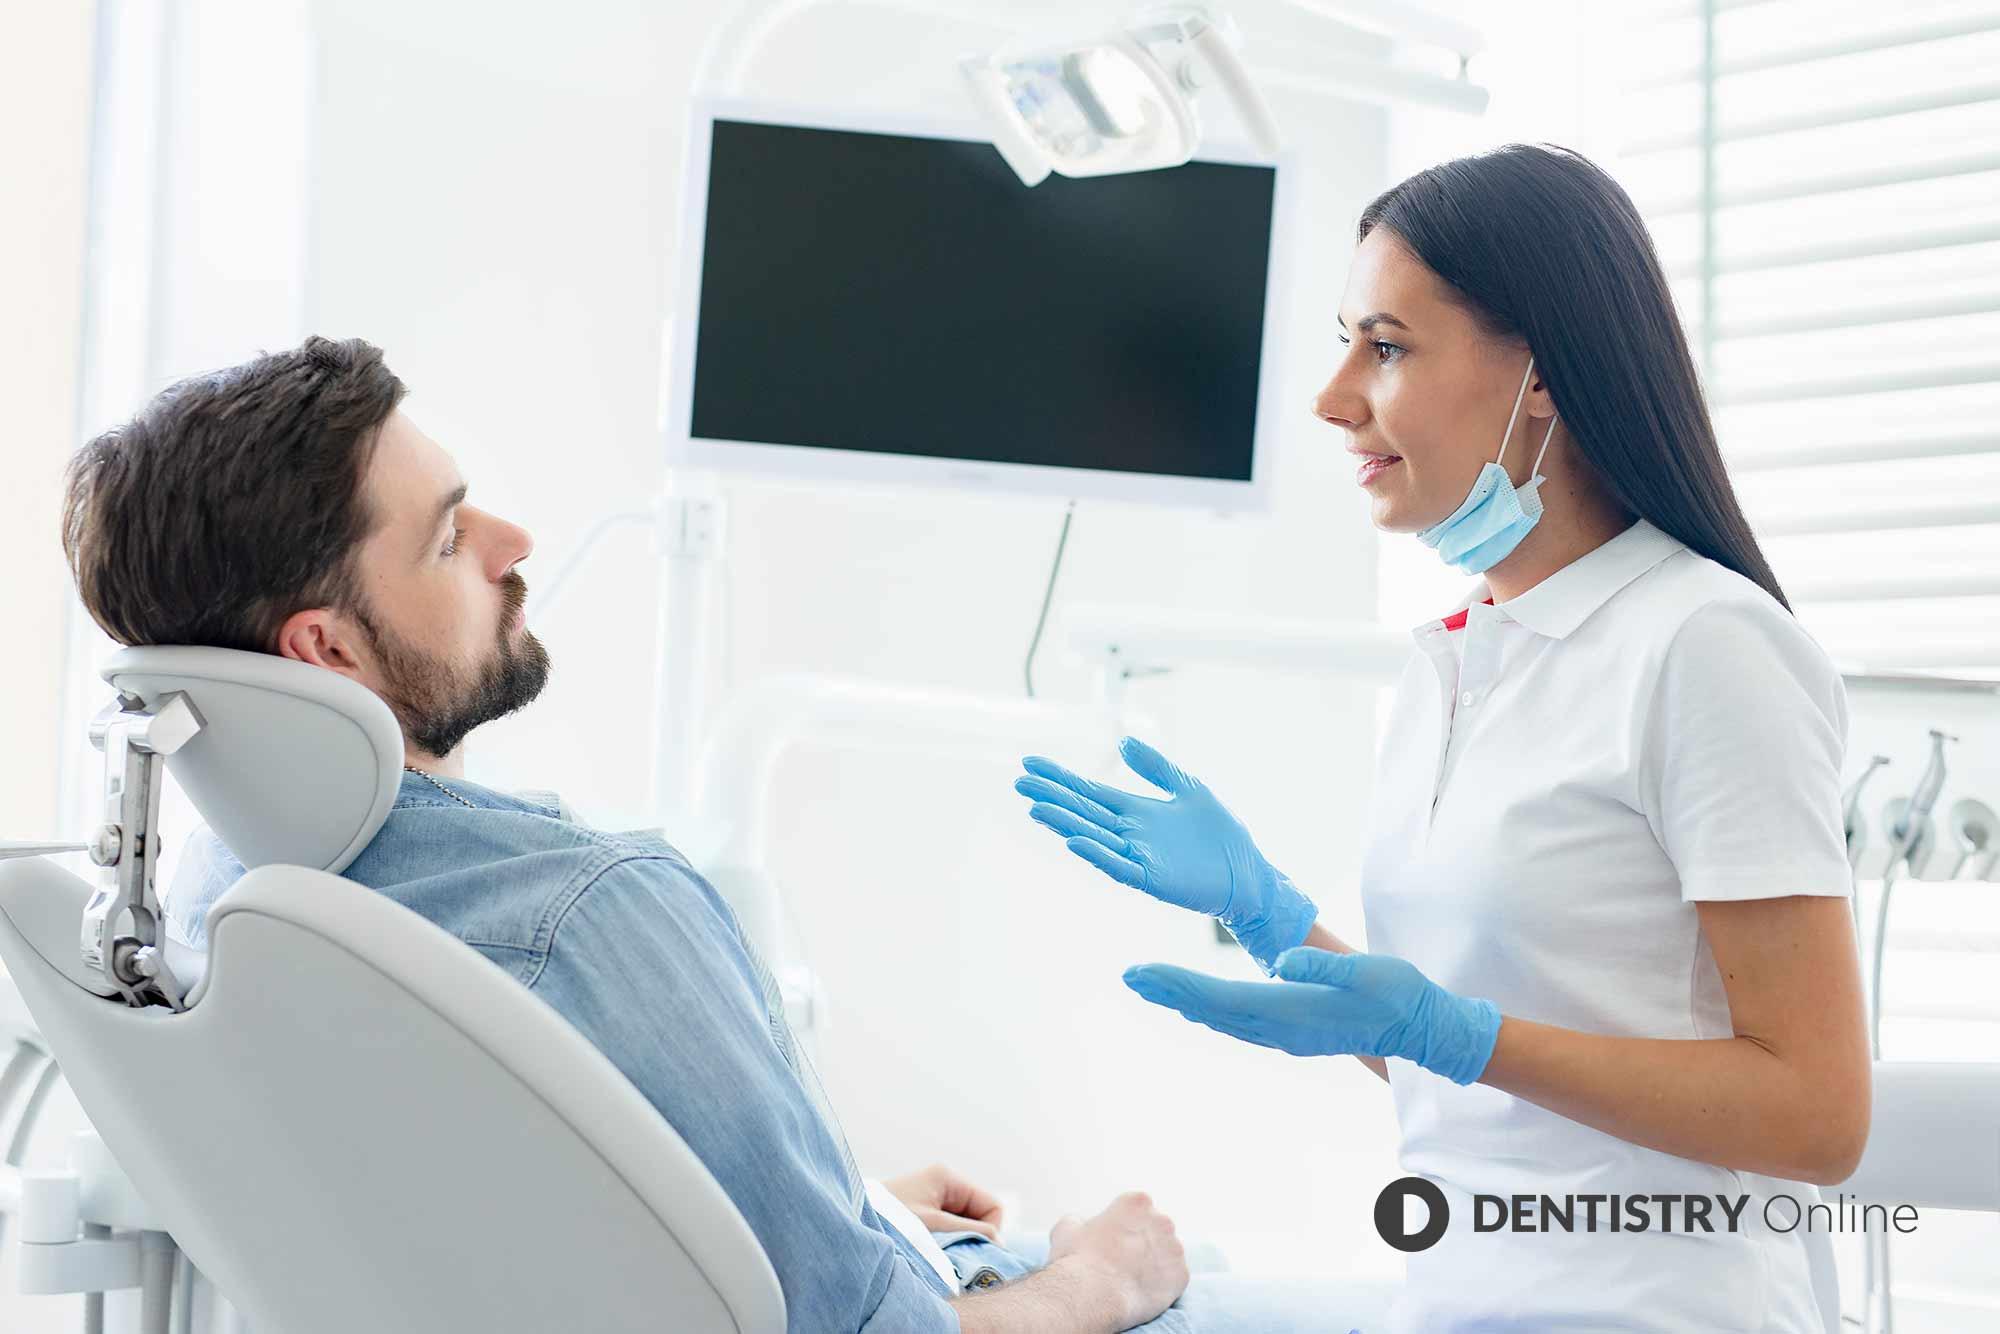 maintaining patient boundaries